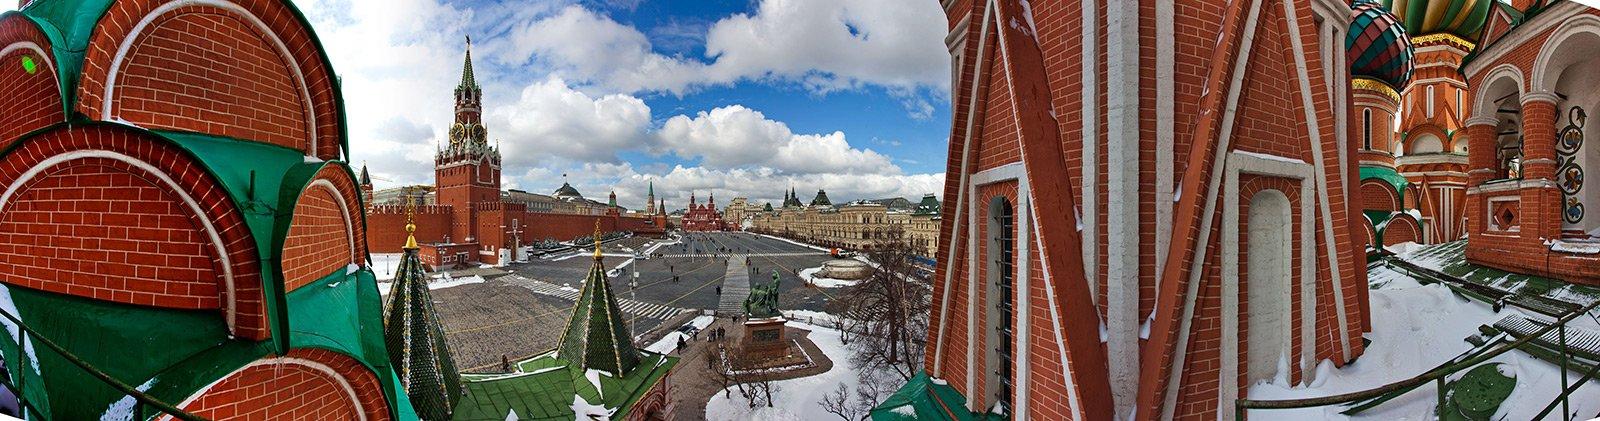 Фото: Николай Рахманов